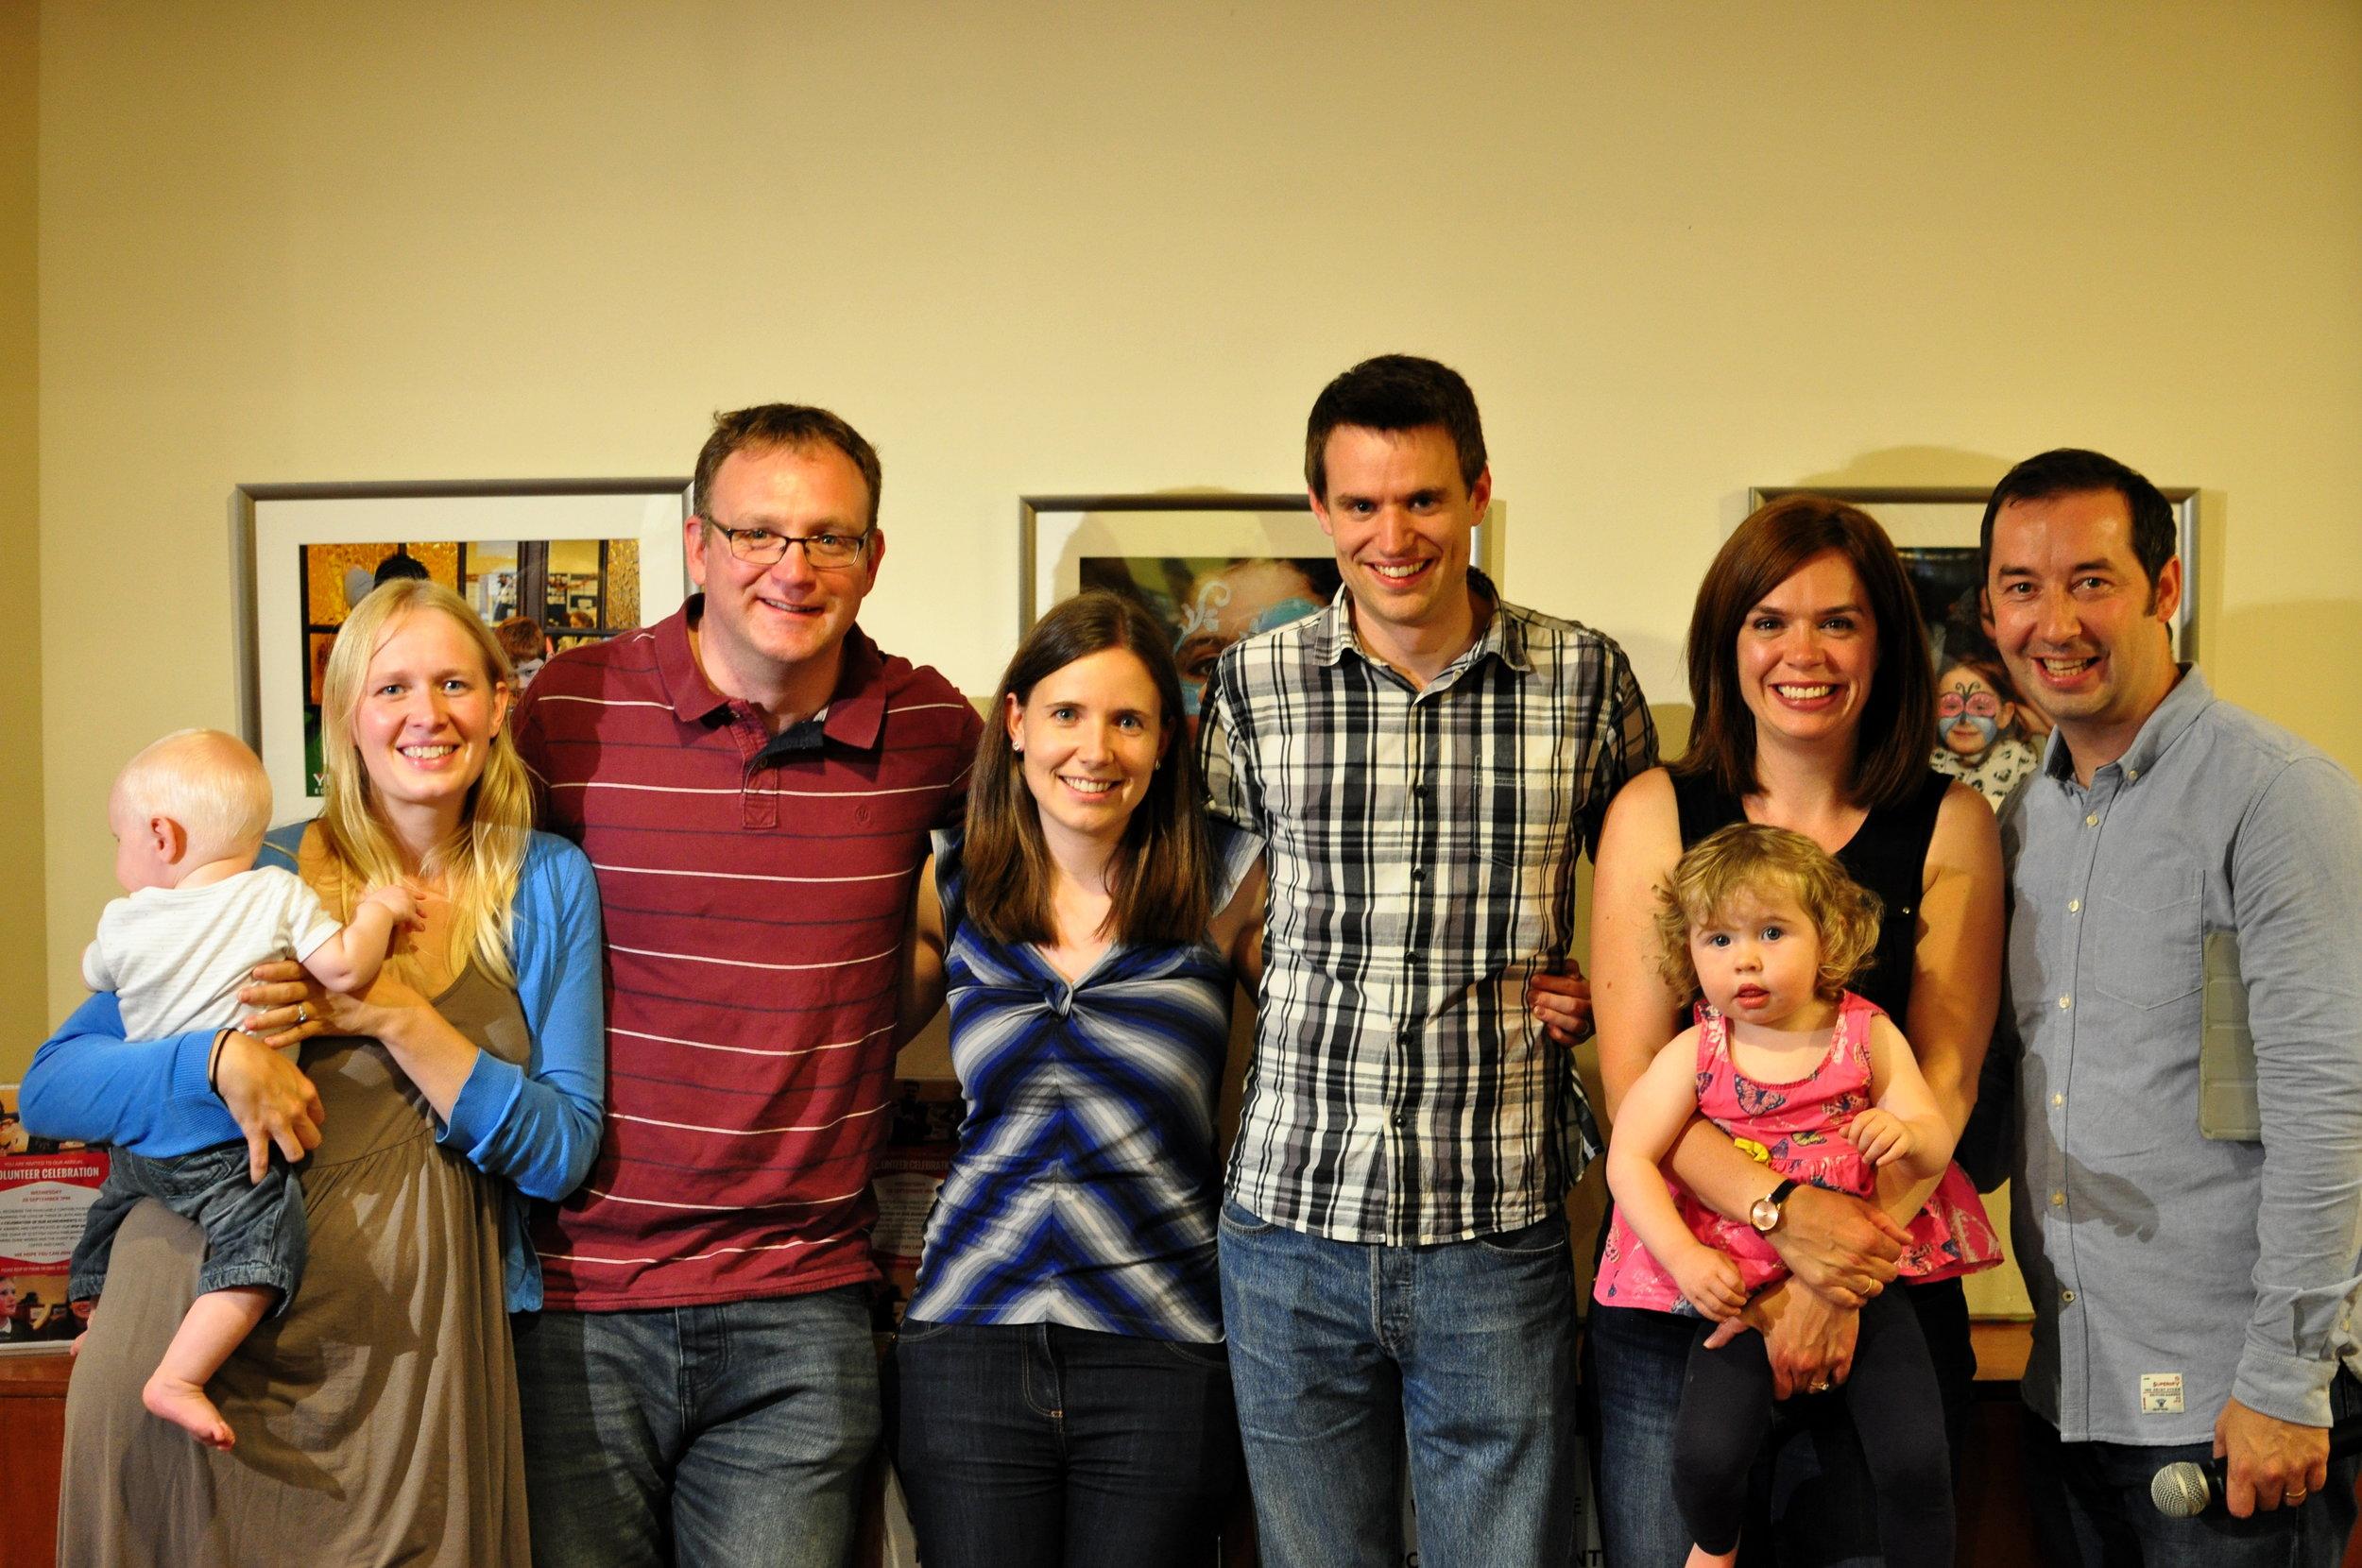 Left to right: Heather & Kenny McGibbon, Laura & Andrew Duckering, Rosalynd & Athole Rennie. Photographer: Josh Ahmed